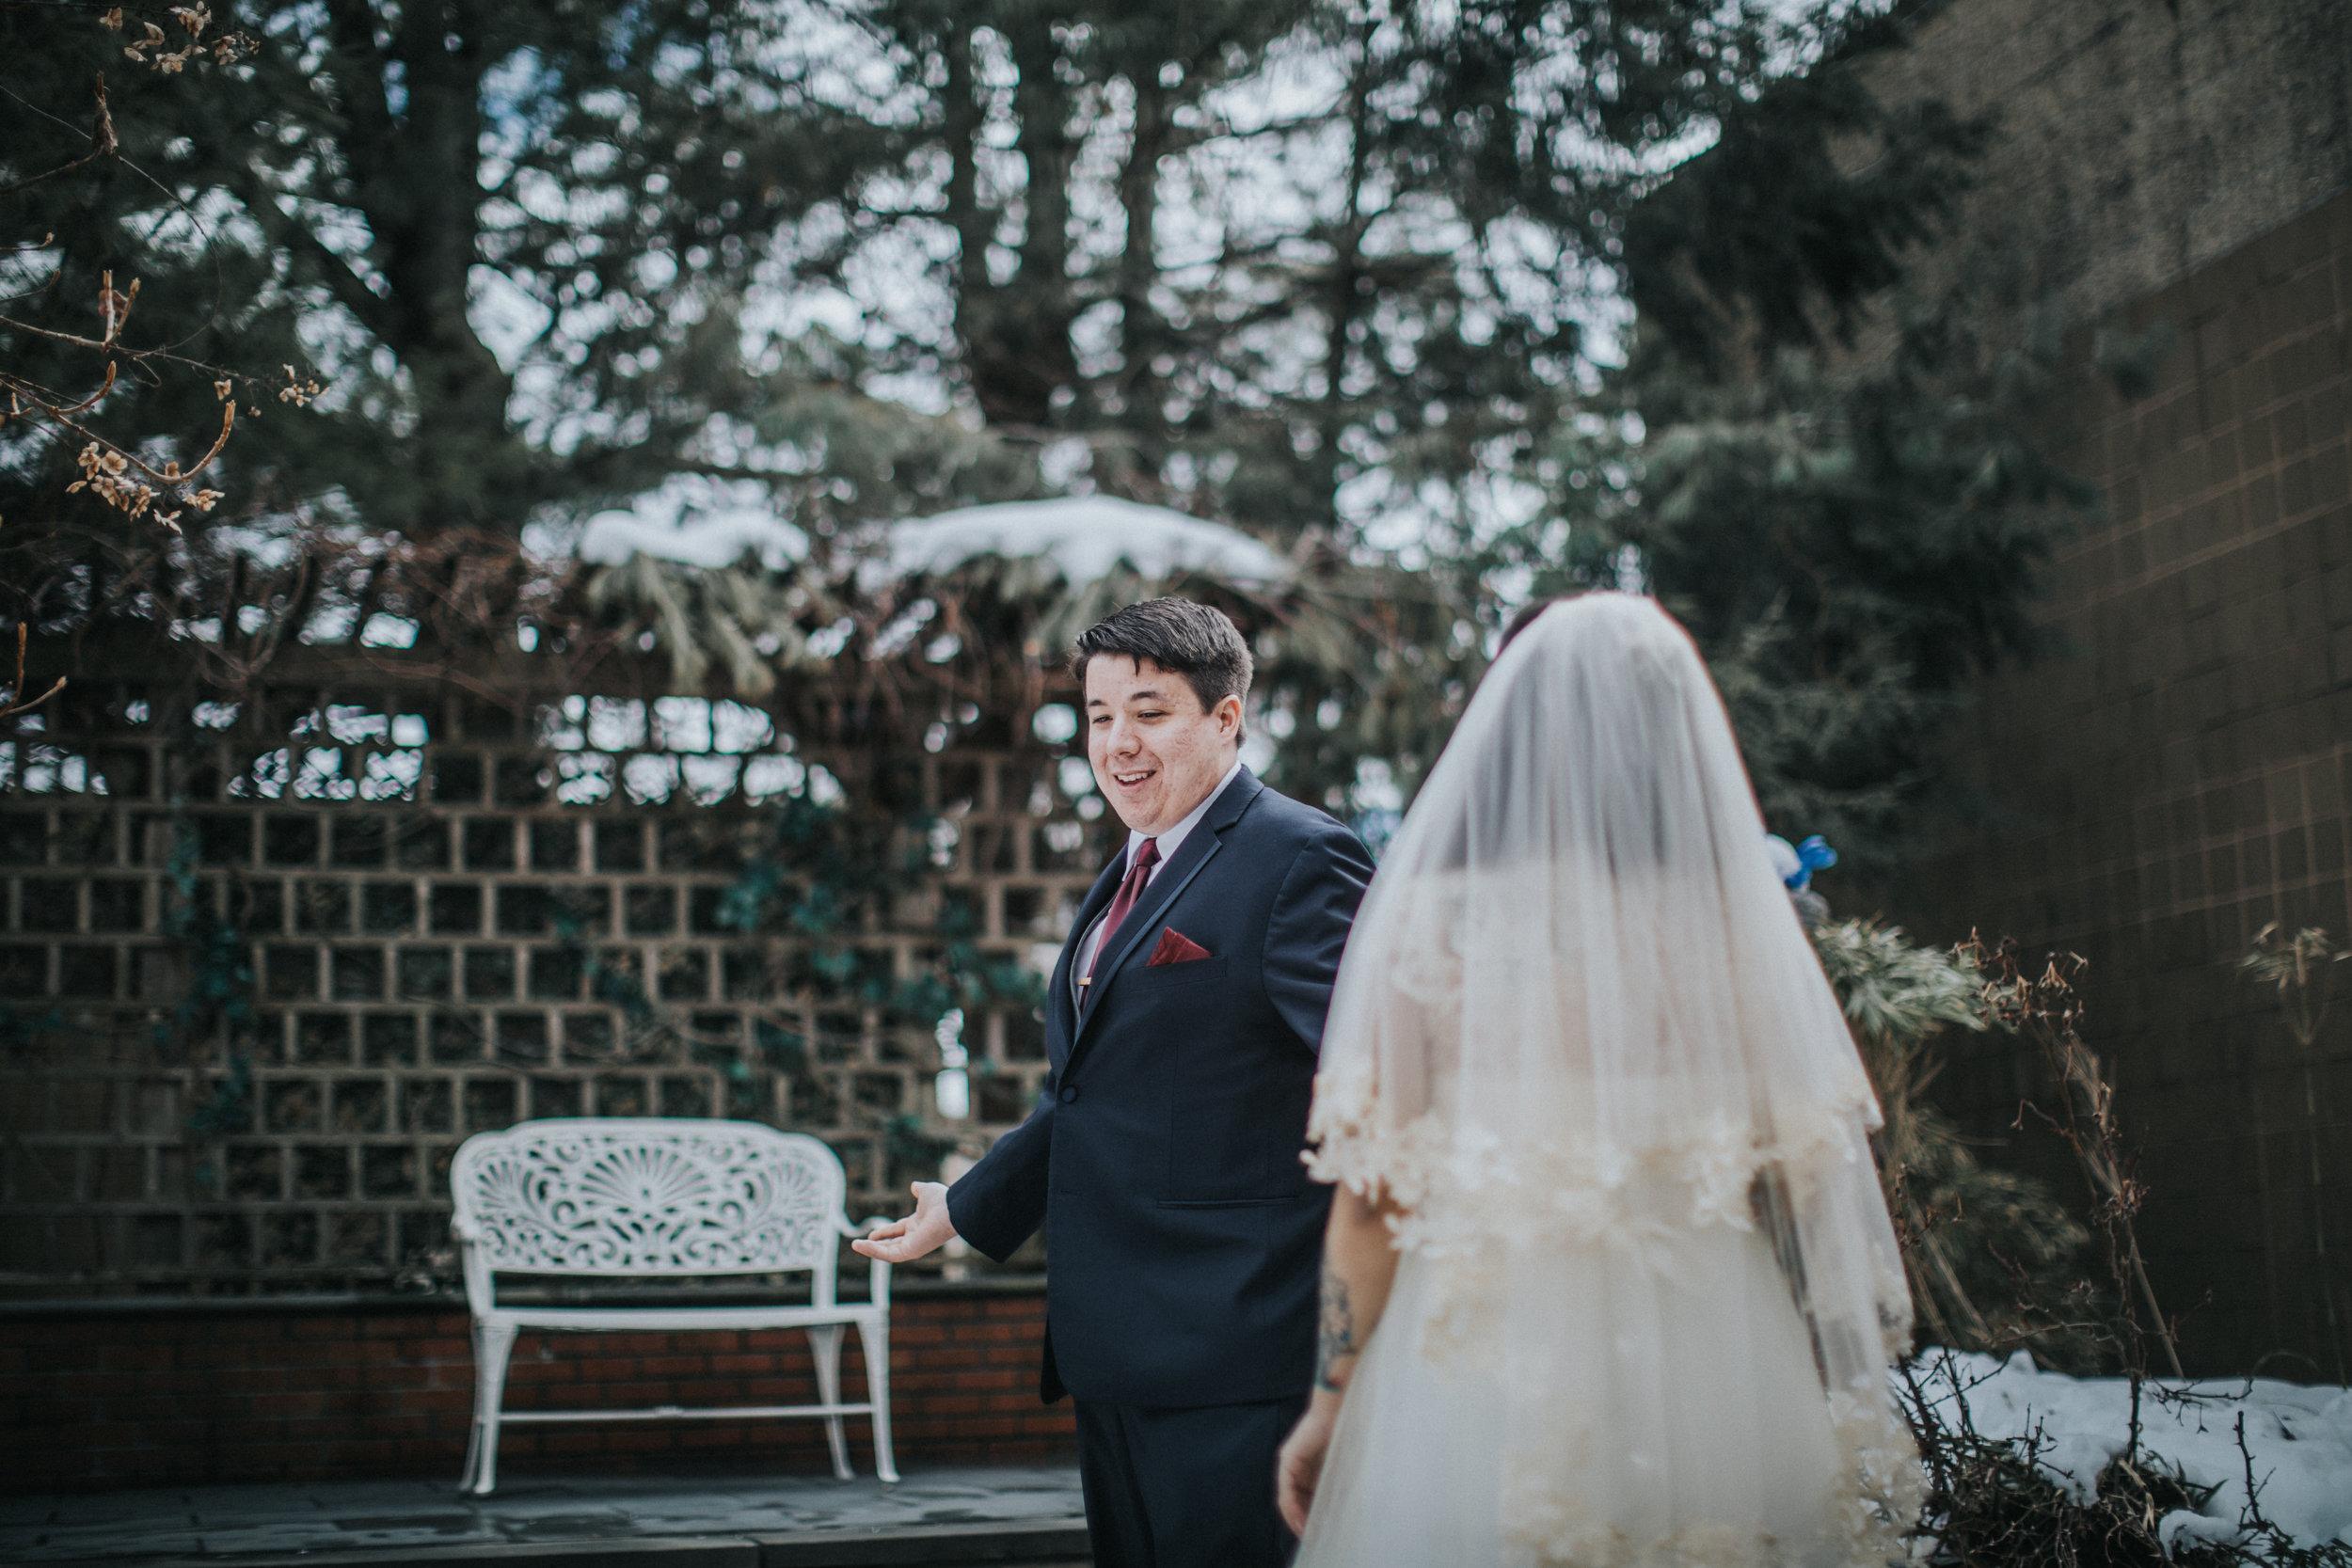 New-Jersey-Wedding-Photographer-ReceptionCenter-Valeria&Mike-First-Look-Bride&Groom (12 of 69).jpg